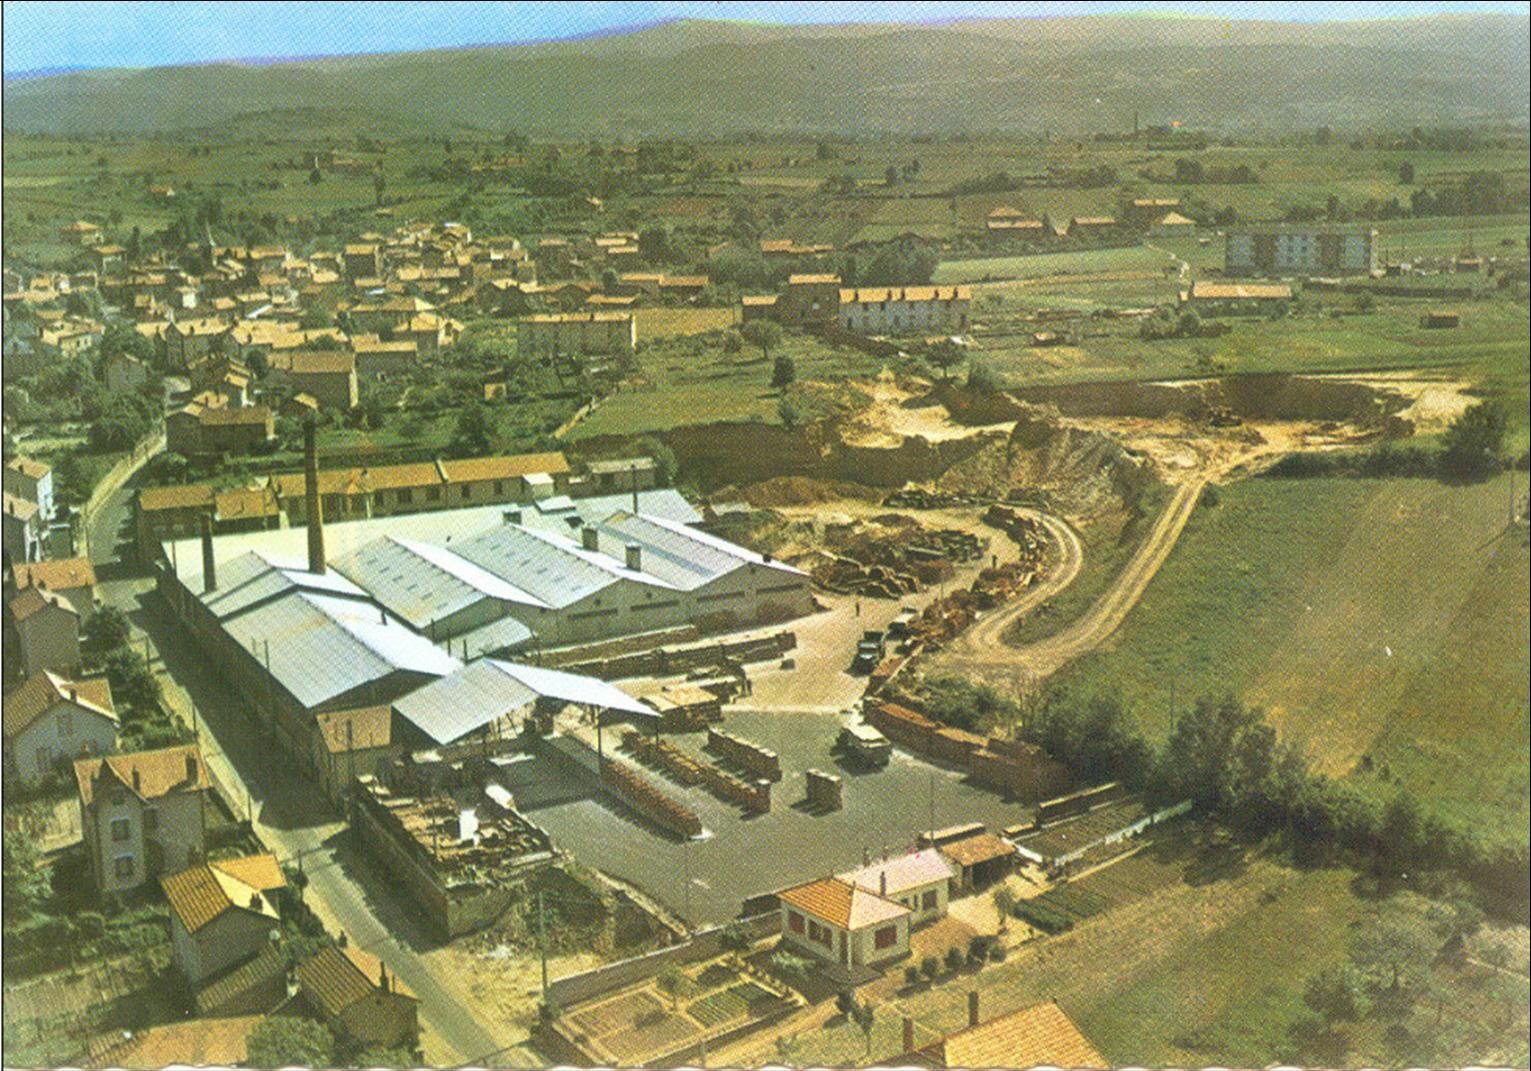 Vergongheon aux années 1950-60